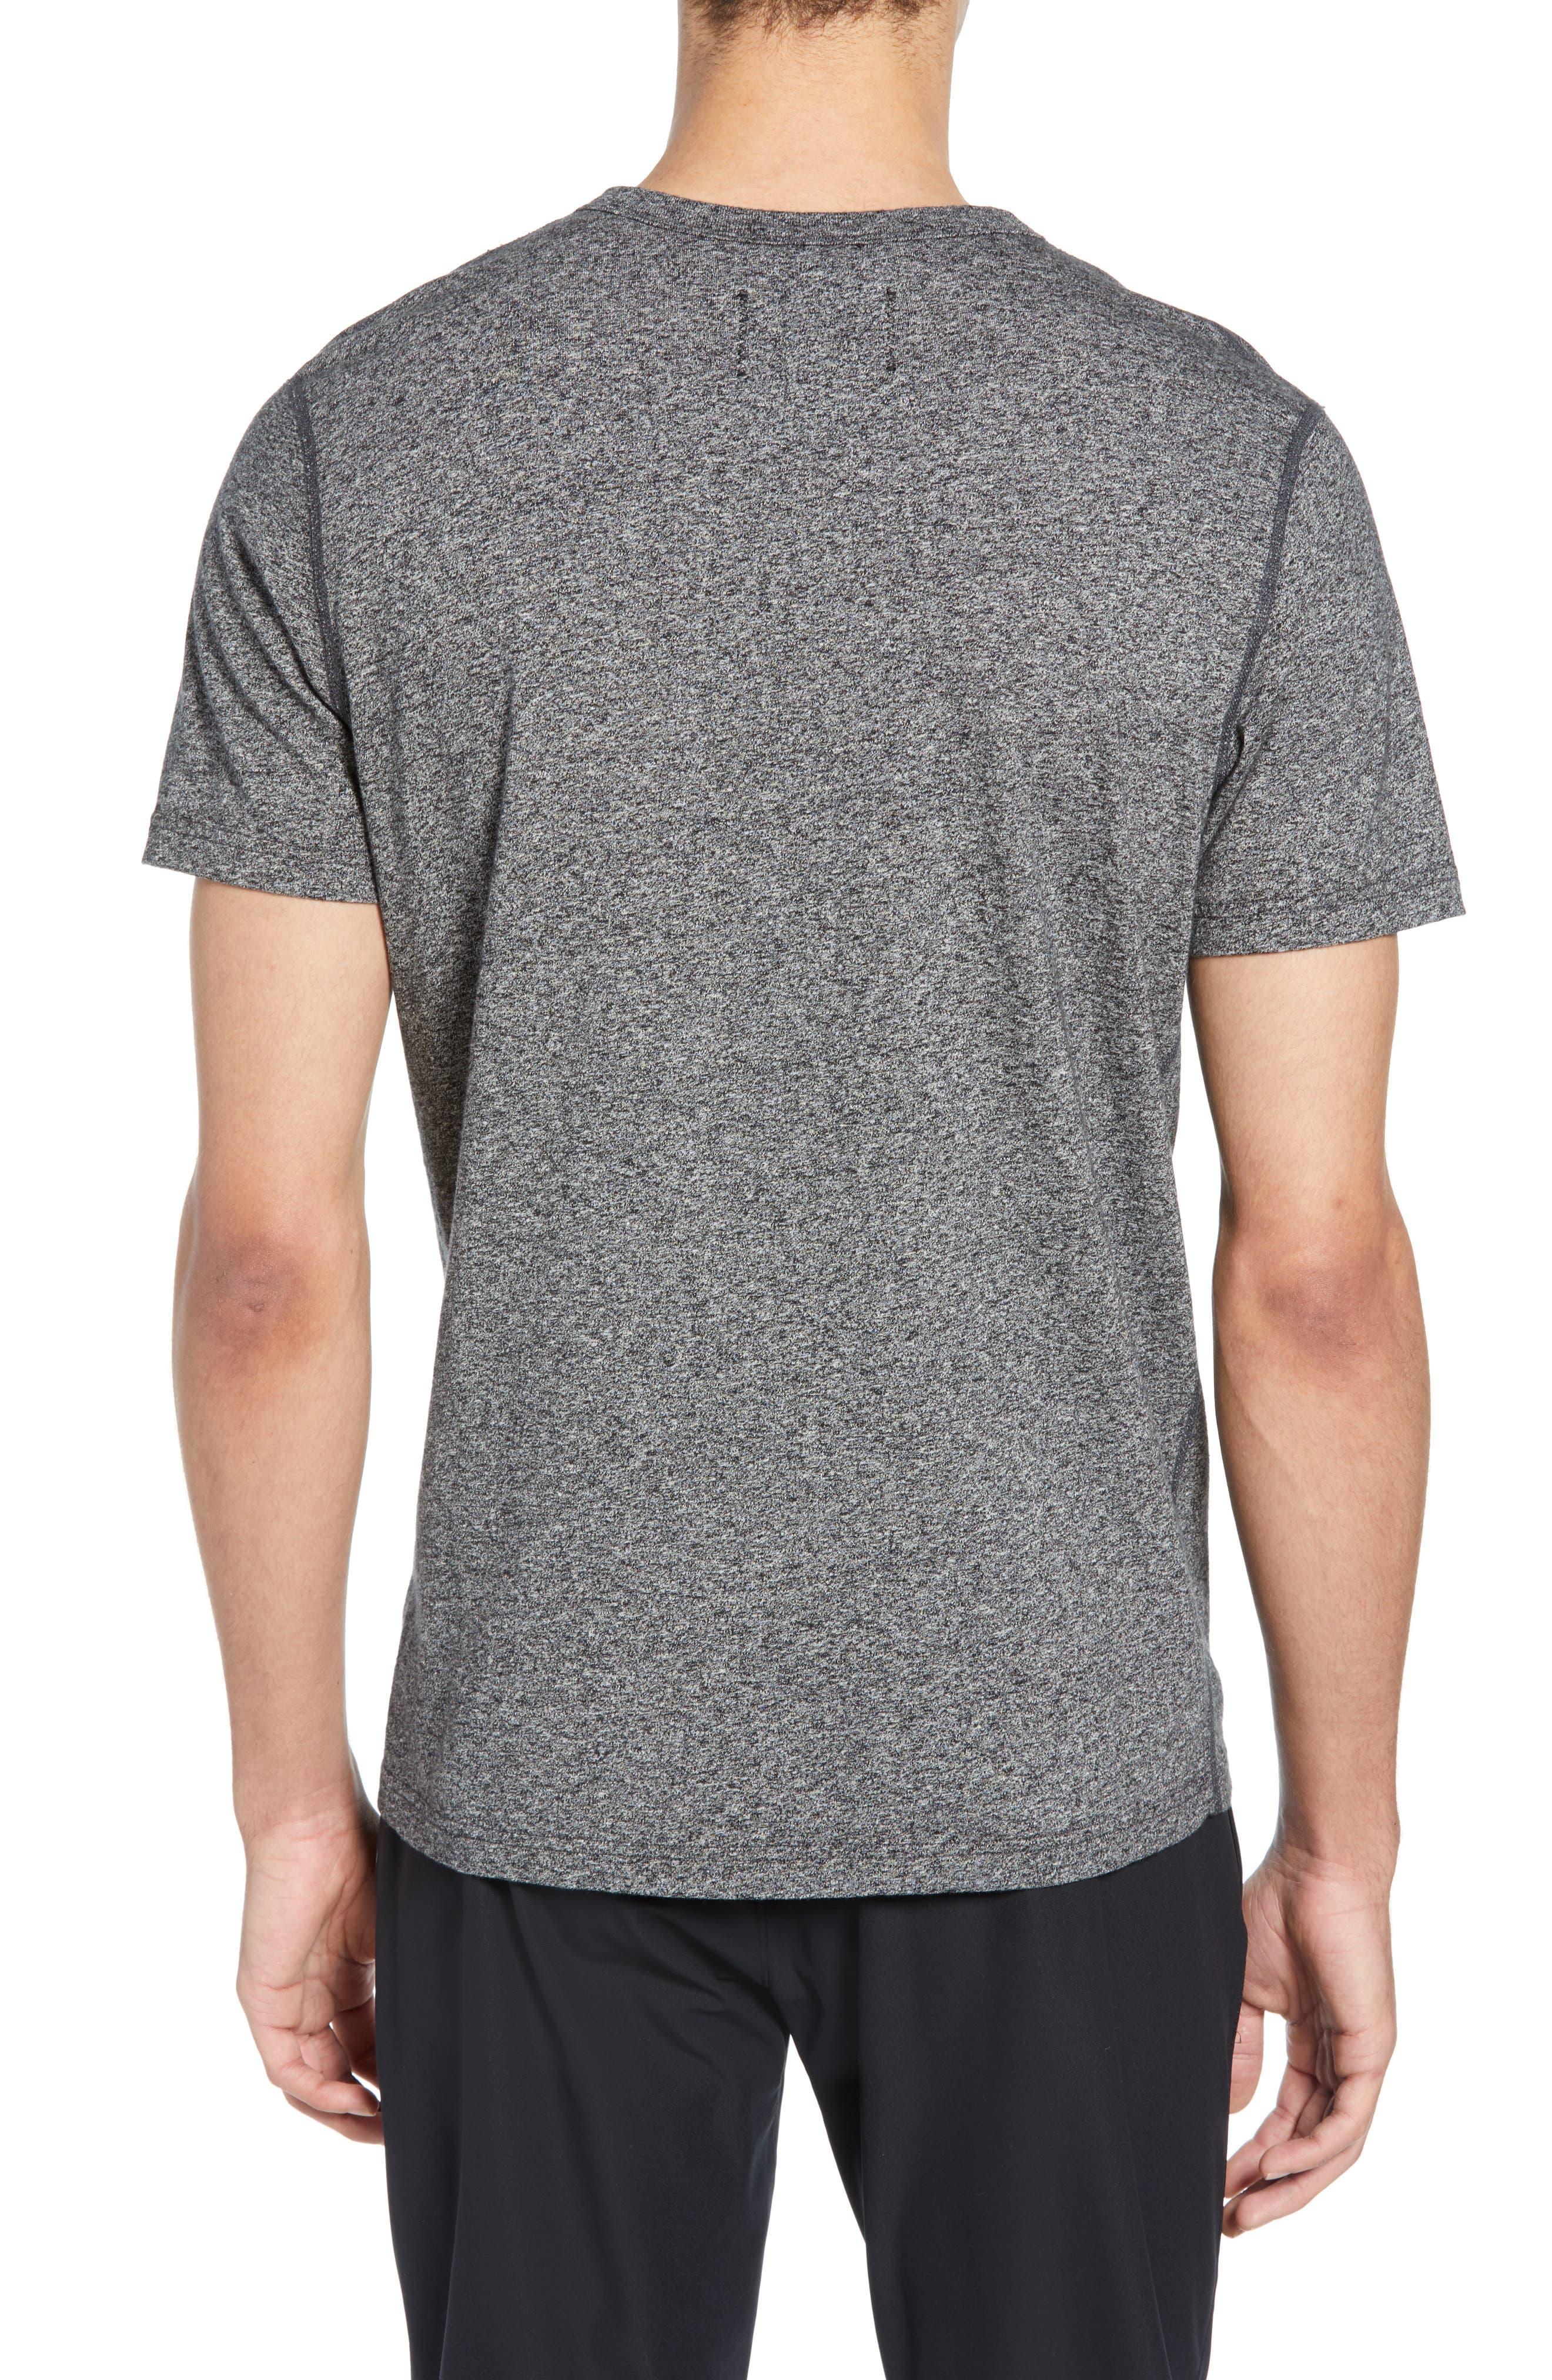 REIGNING CHAMP,                             Short Sleeve Crewneck T-Shirt,                             Alternate thumbnail 2, color,                             MEDIUM BLACK